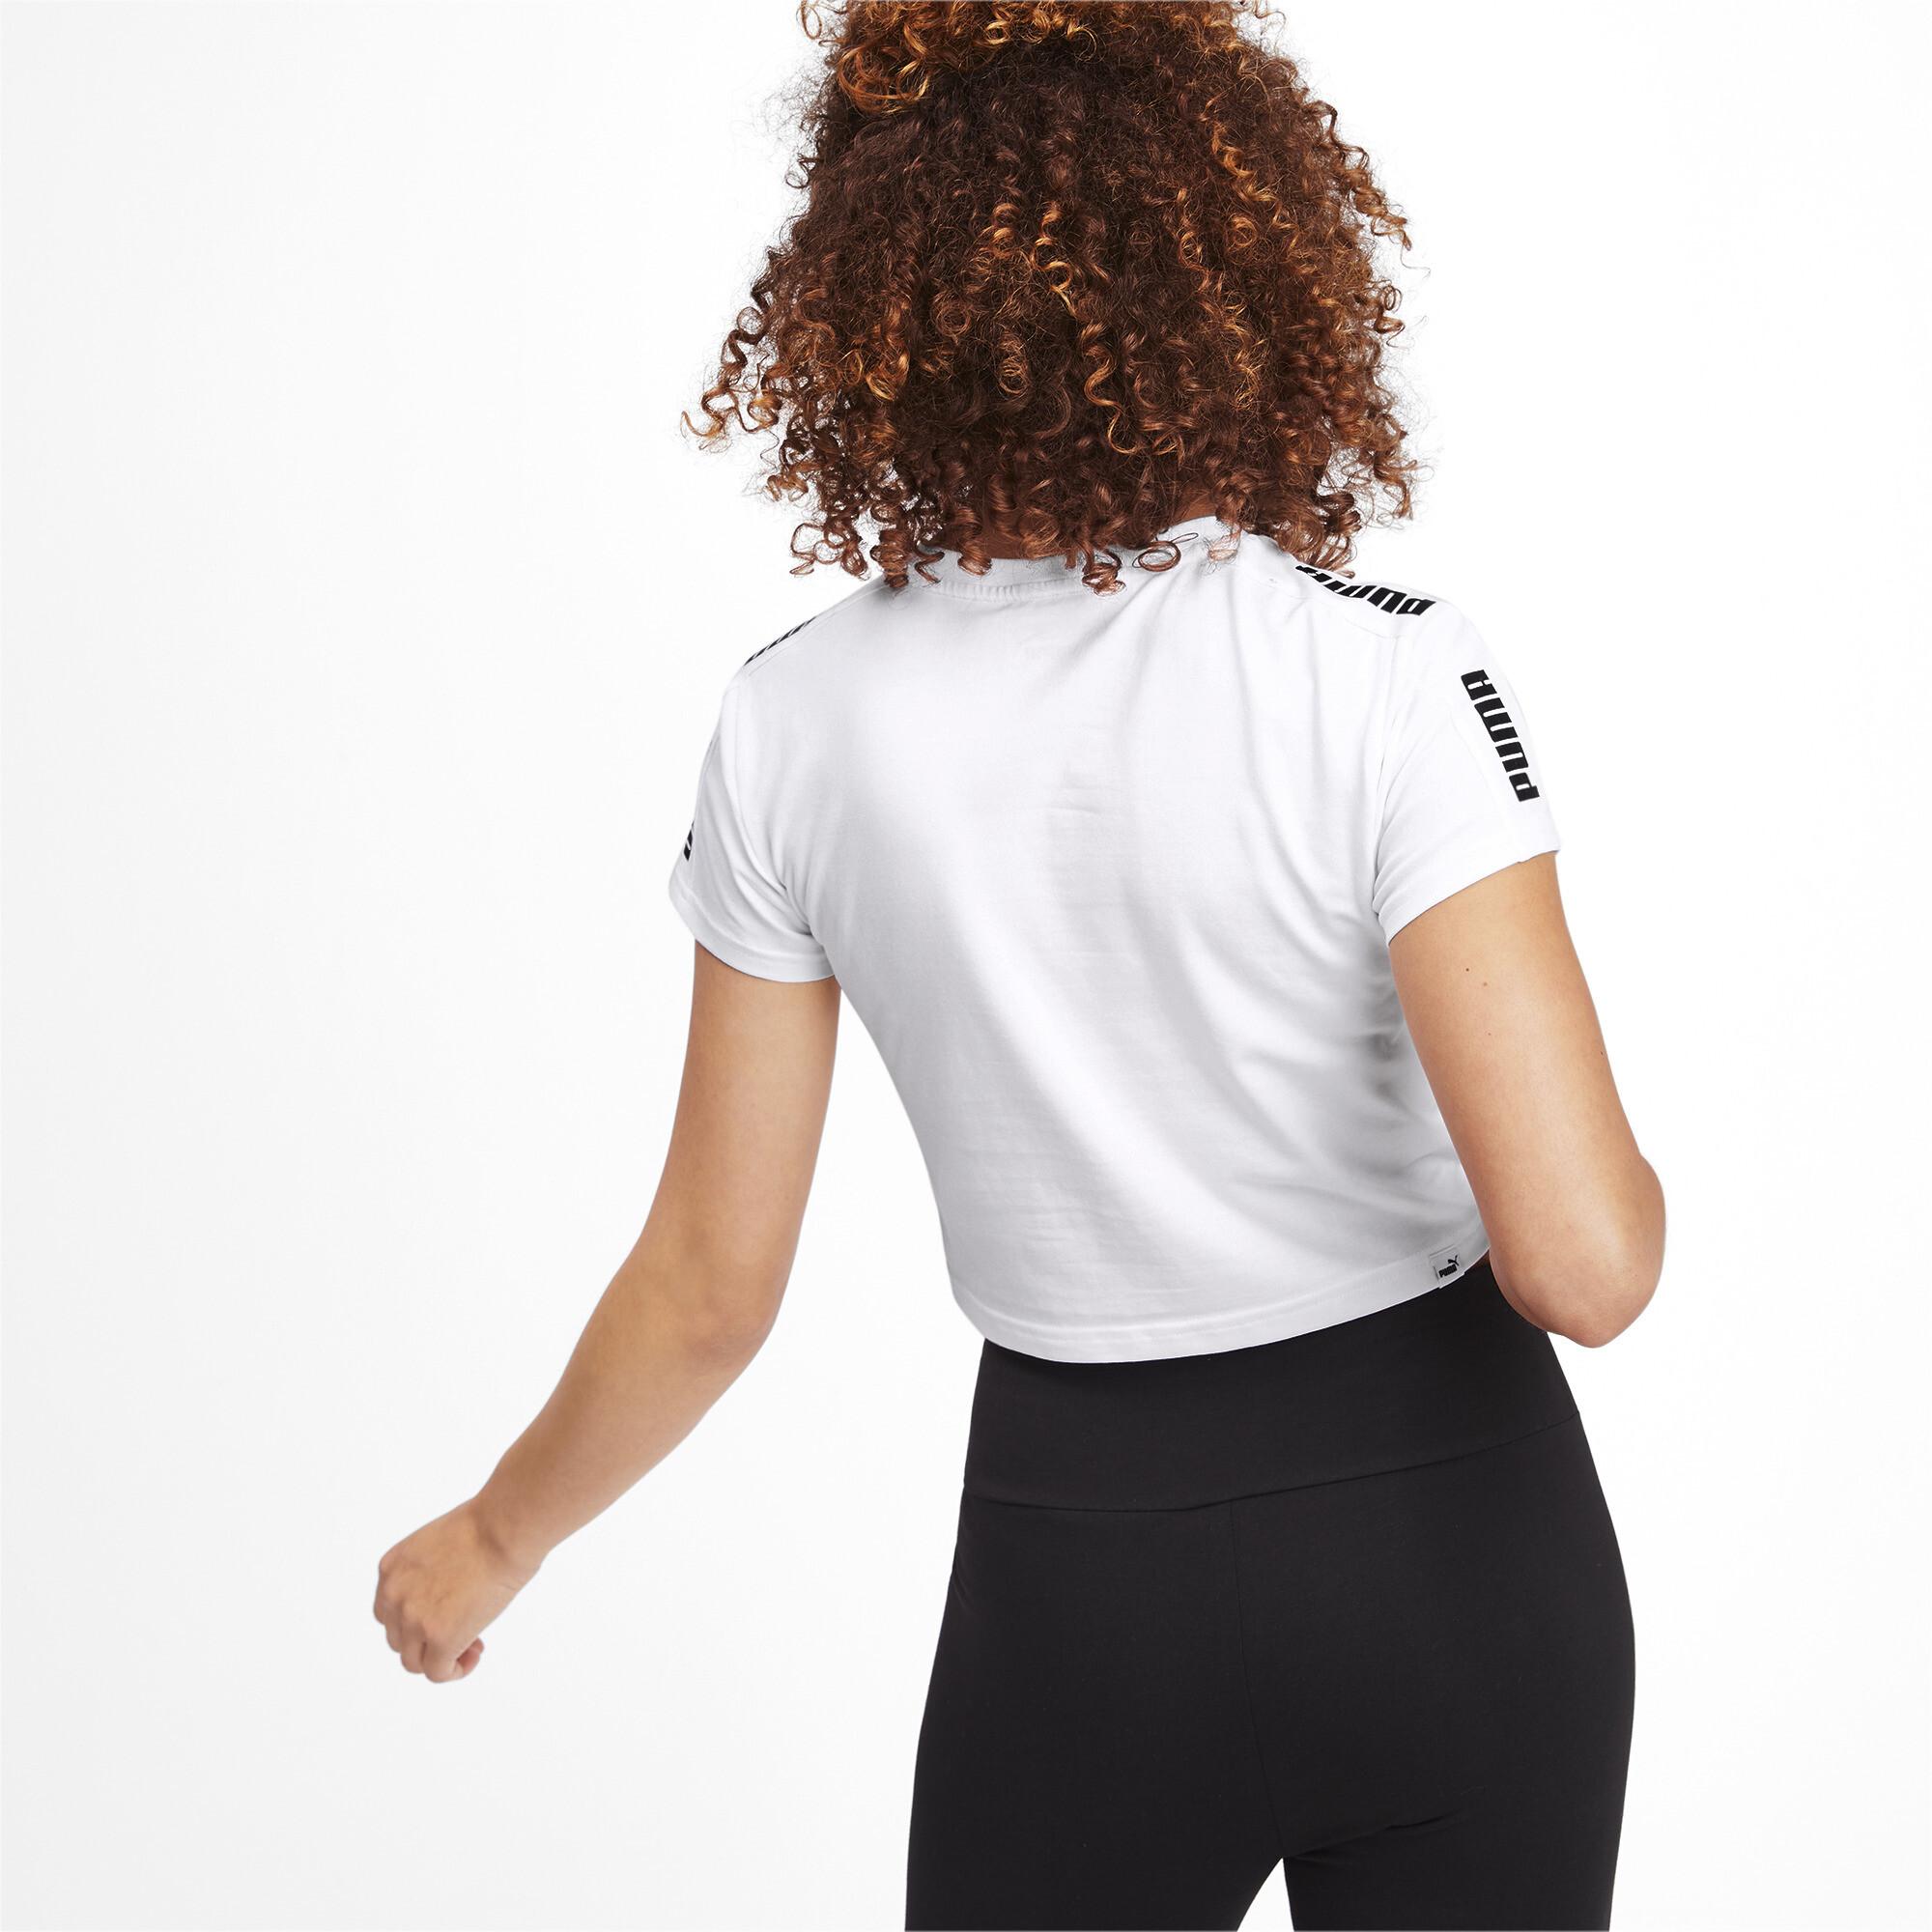 PUMA-Amplified-Women-039-s-Fitted-Logo-Tee-Women-Tee-Basics thumbnail 10